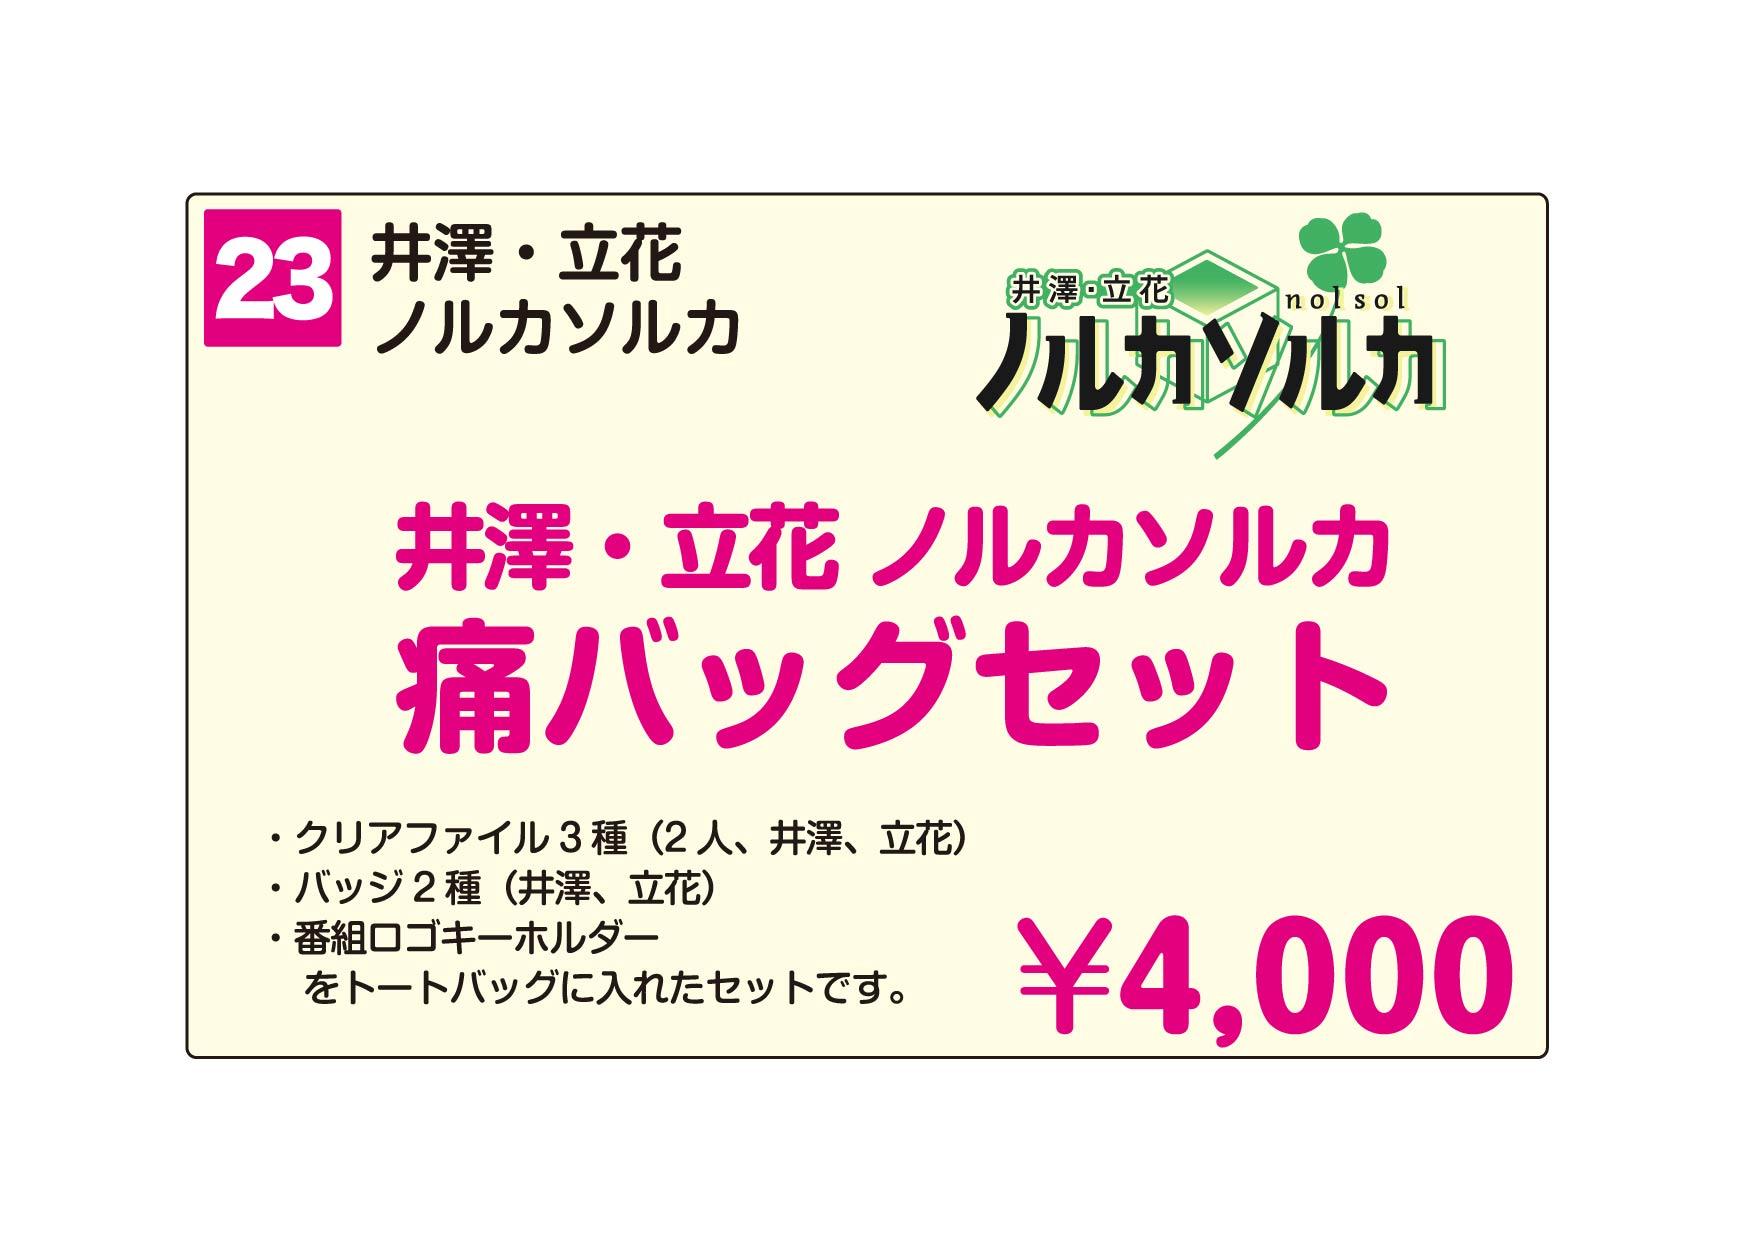 http://www.joqr.co.jp/AandG_booth/23.jpg